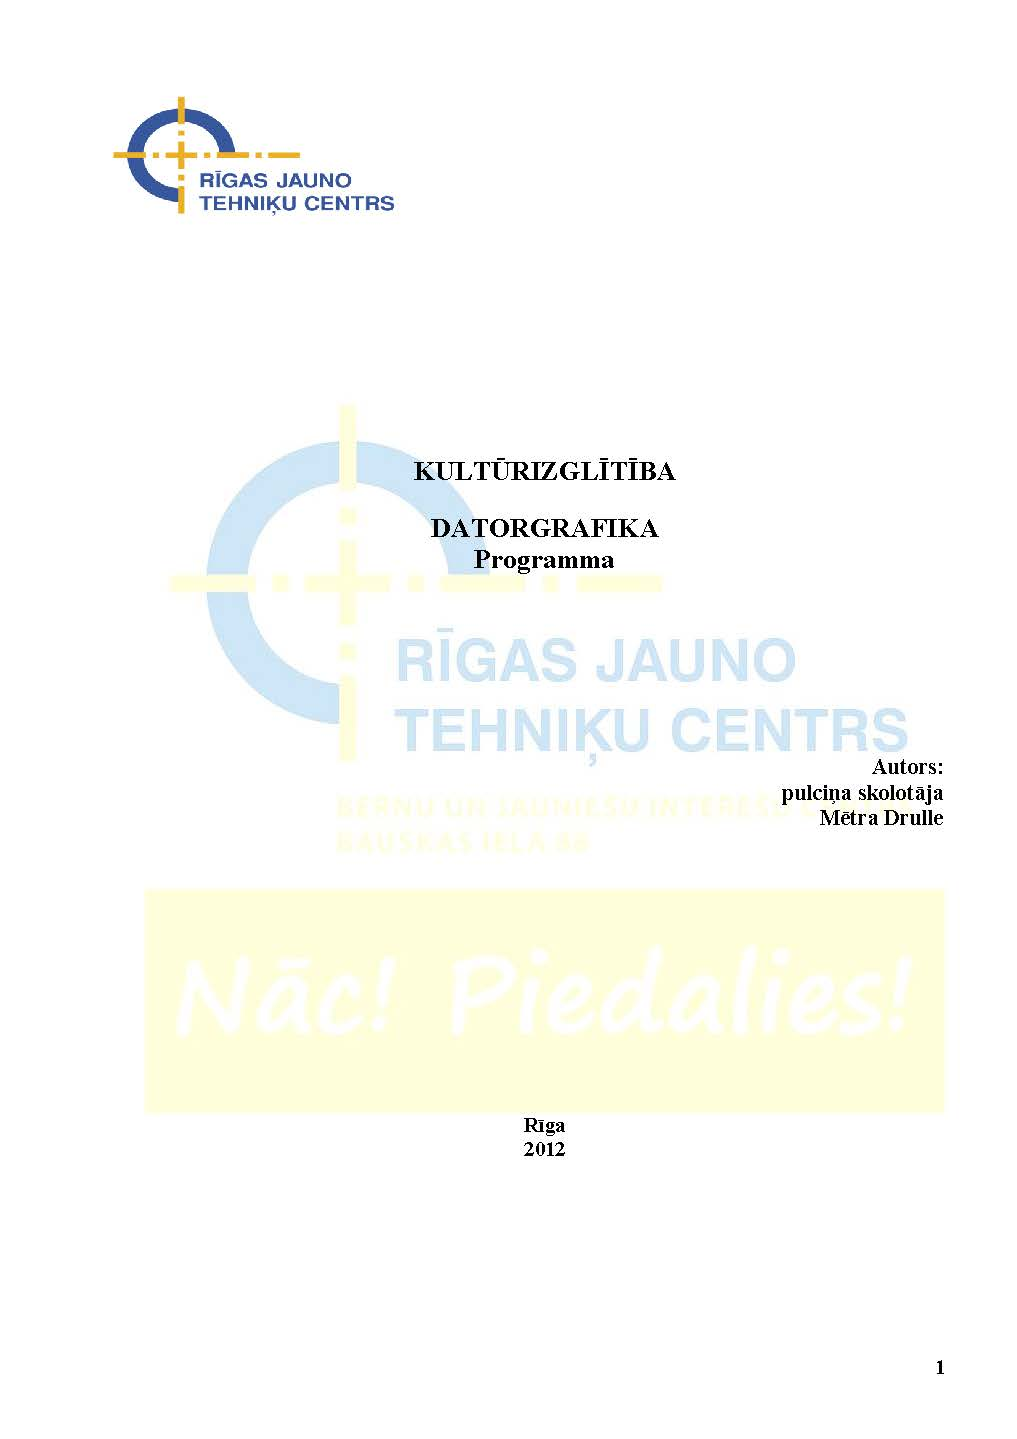 datorgrafikas-programma_page_1